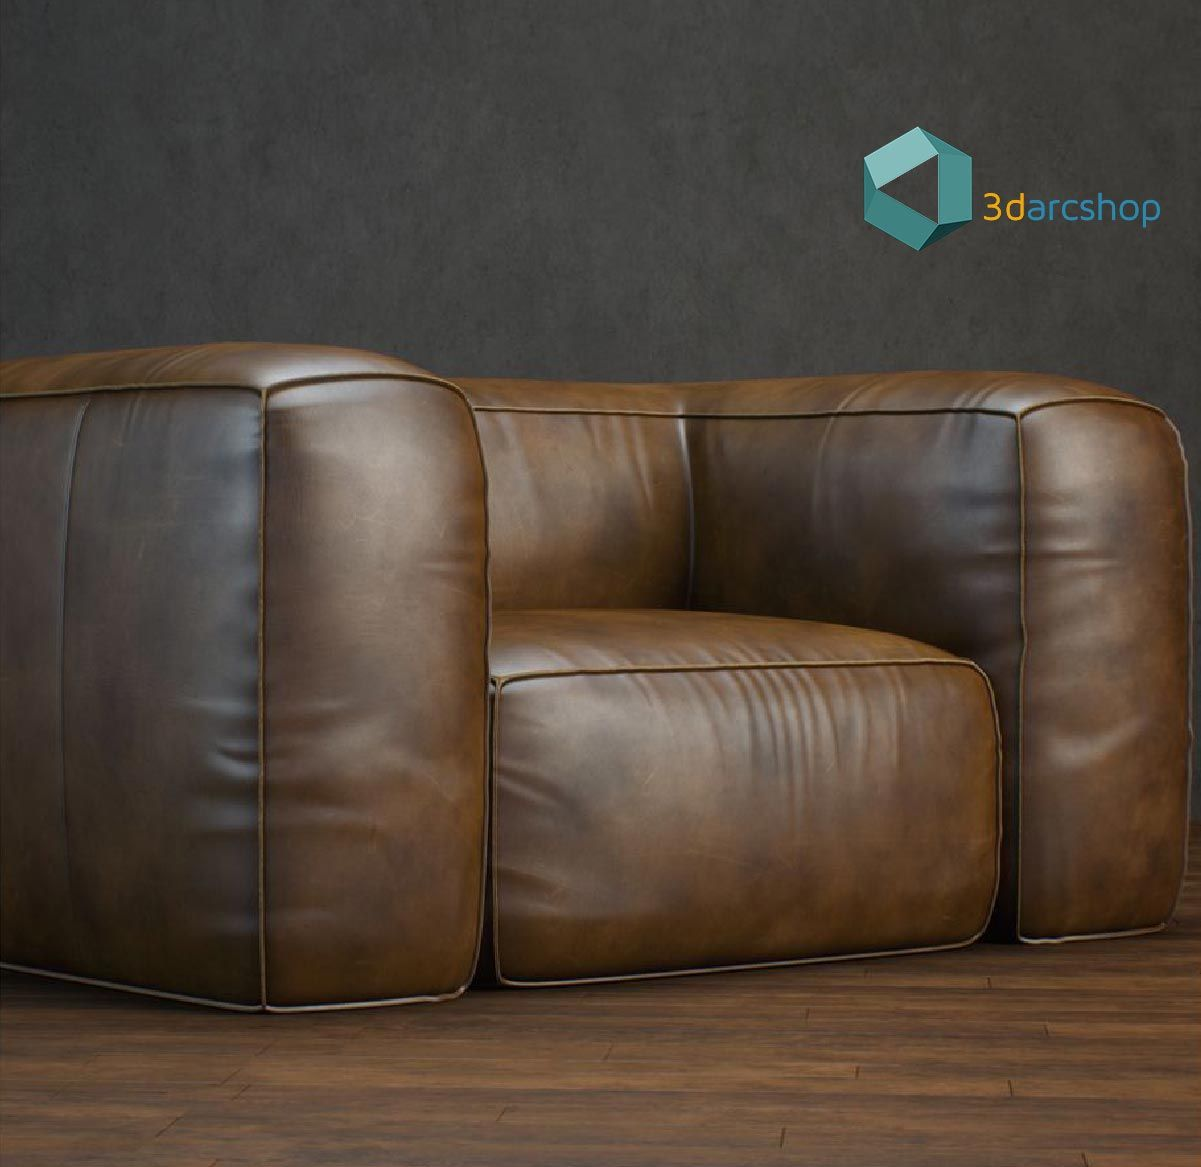 Modelos 3D Gratis XCI | Mobiliario | Blender | Pinterest | Modelos ...